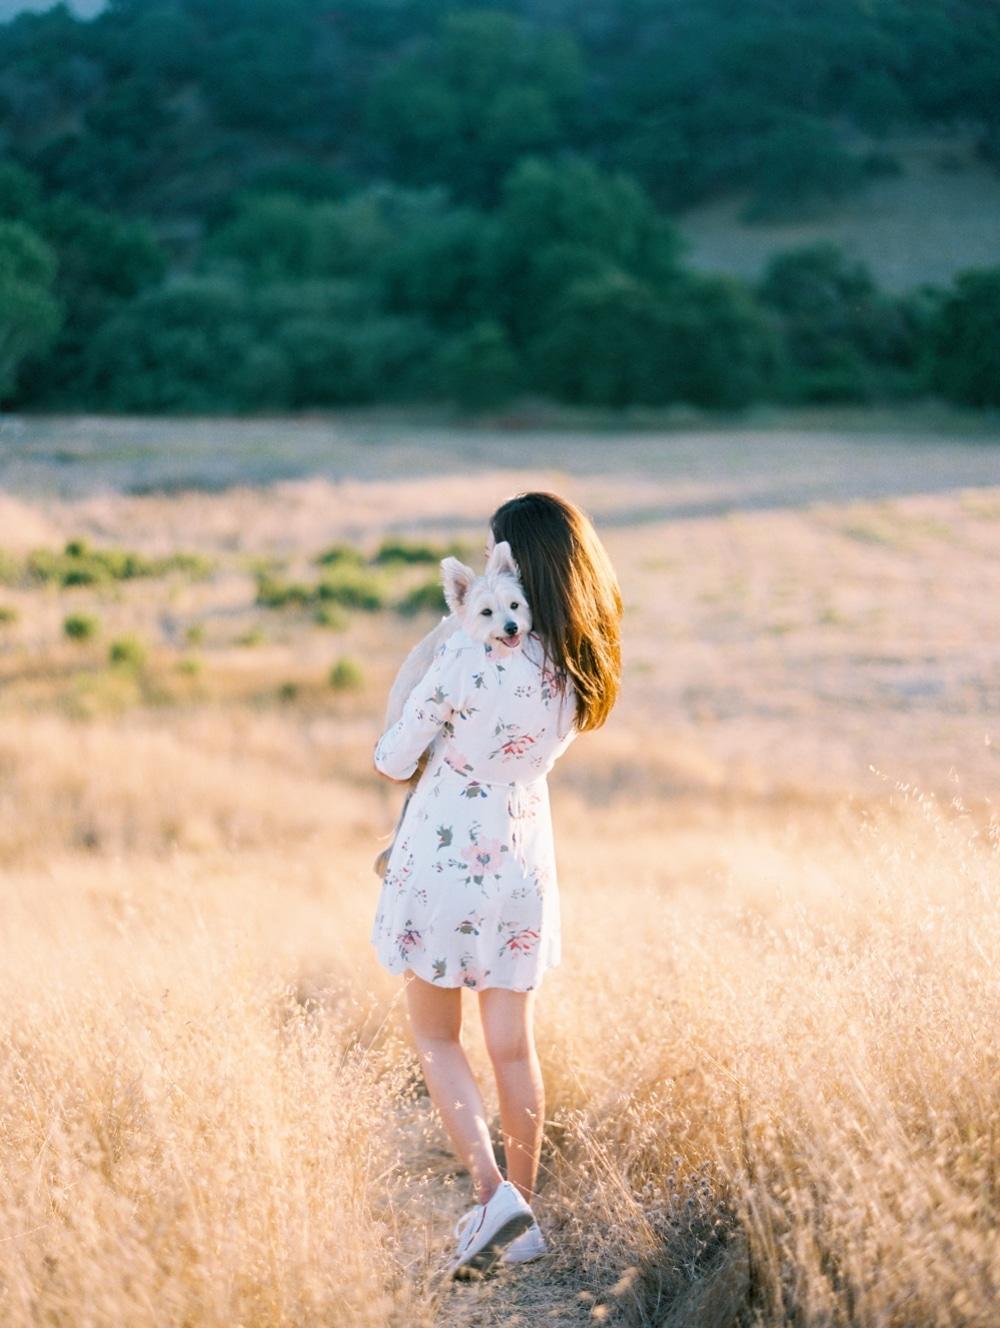 Kristin-La-Voie-Photography-california-wedding-photographer-dog-session-rancho-san-antonio-los-altos-13